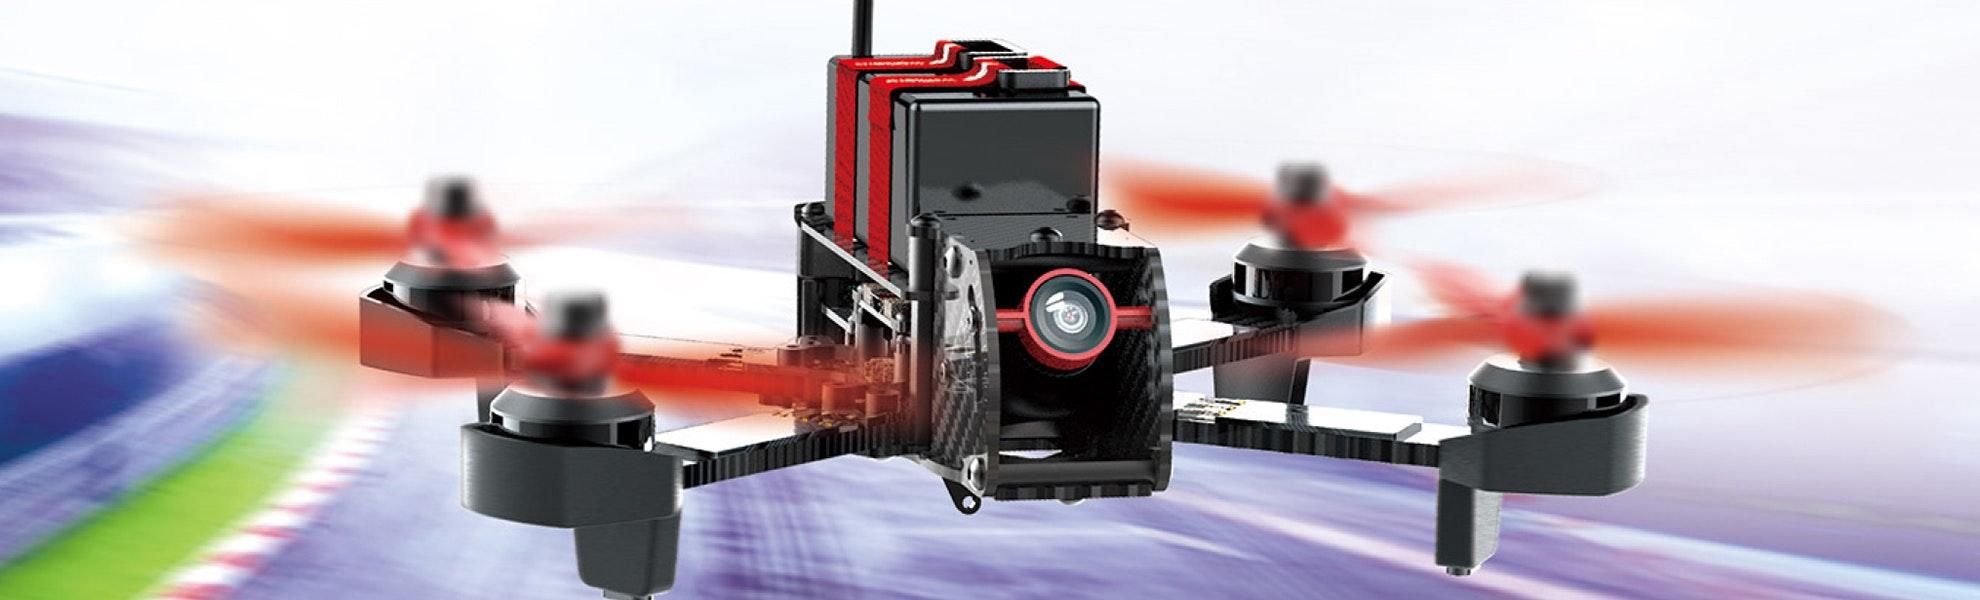 Walkera Furious 215 Mini FPV Racing Drone